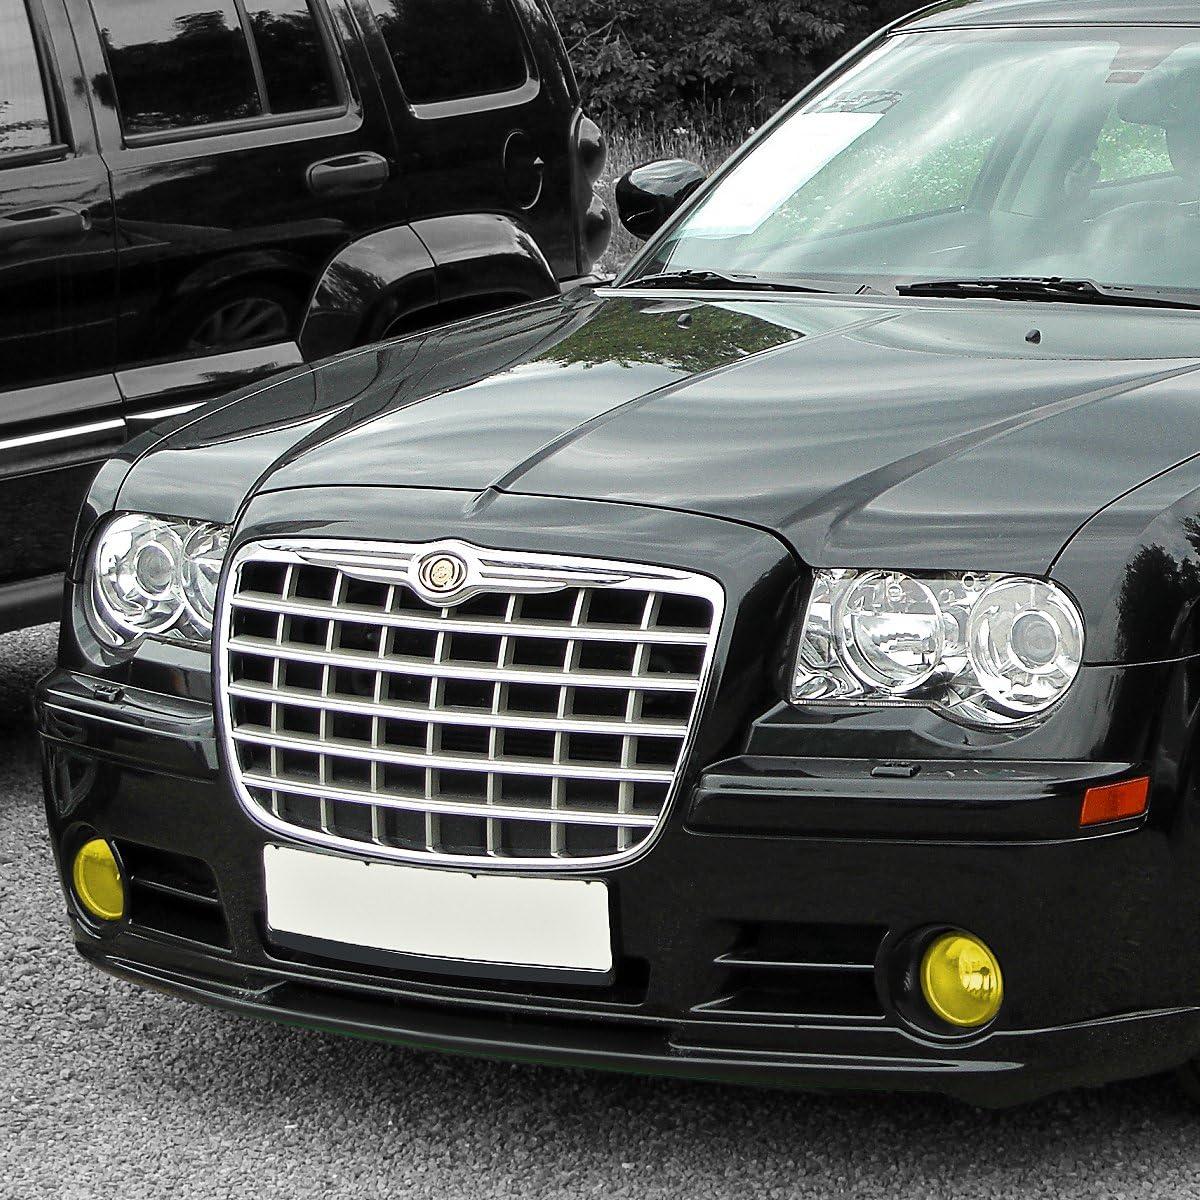 Lights & Lighting Accessories Automotive DNA Motoring FL-T002-AM ...